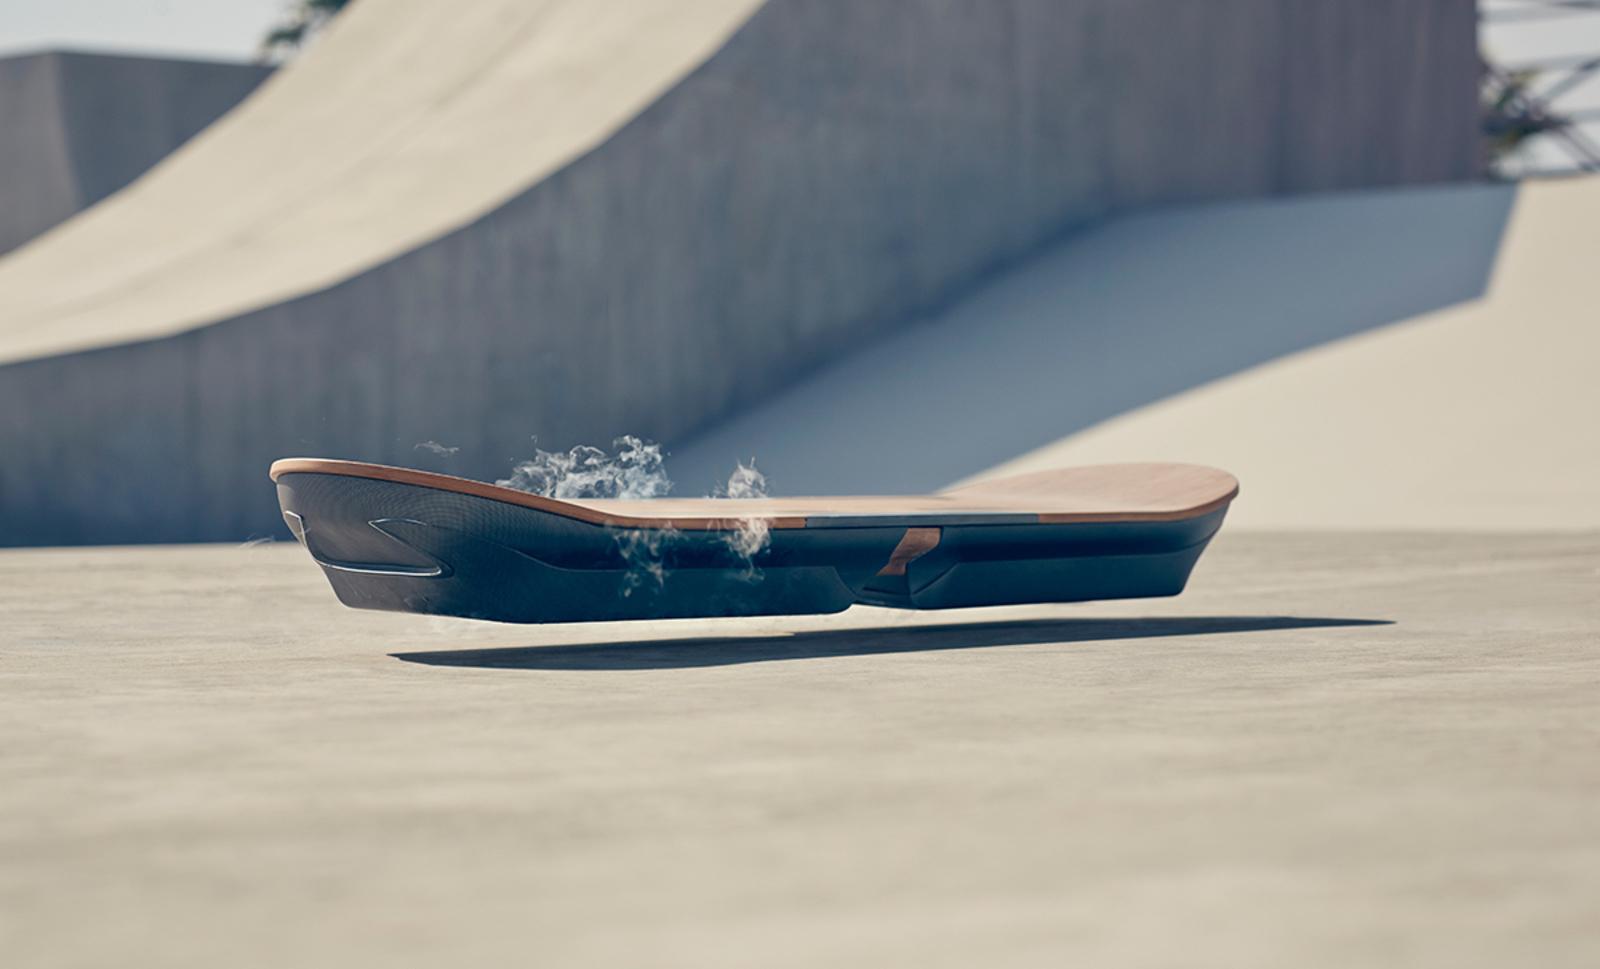 Lexus' Special Hoverboard Skate Park